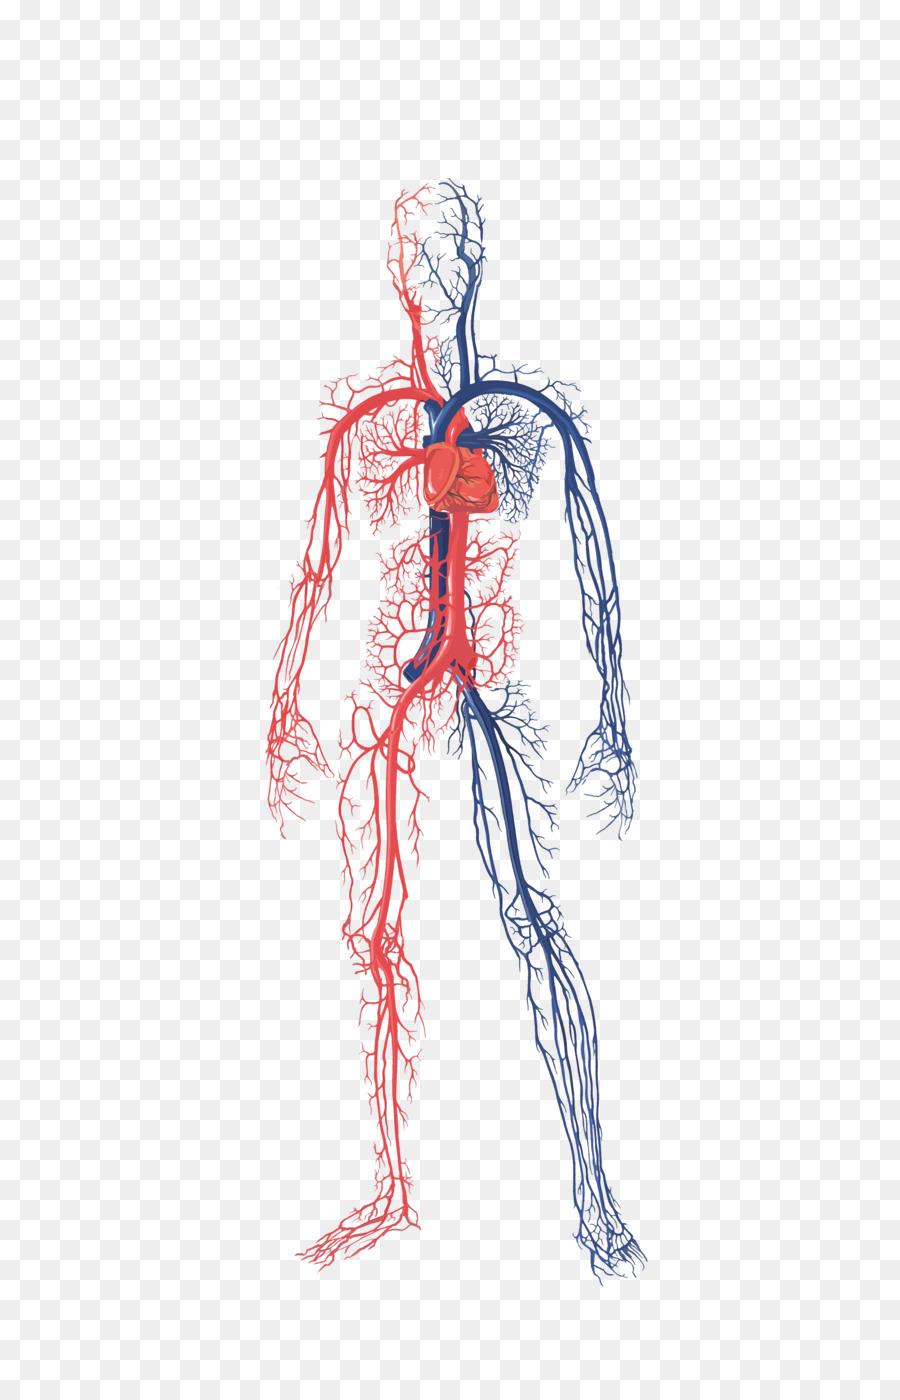 Download Circulatory System Of A Human Body Clipart Circulatory